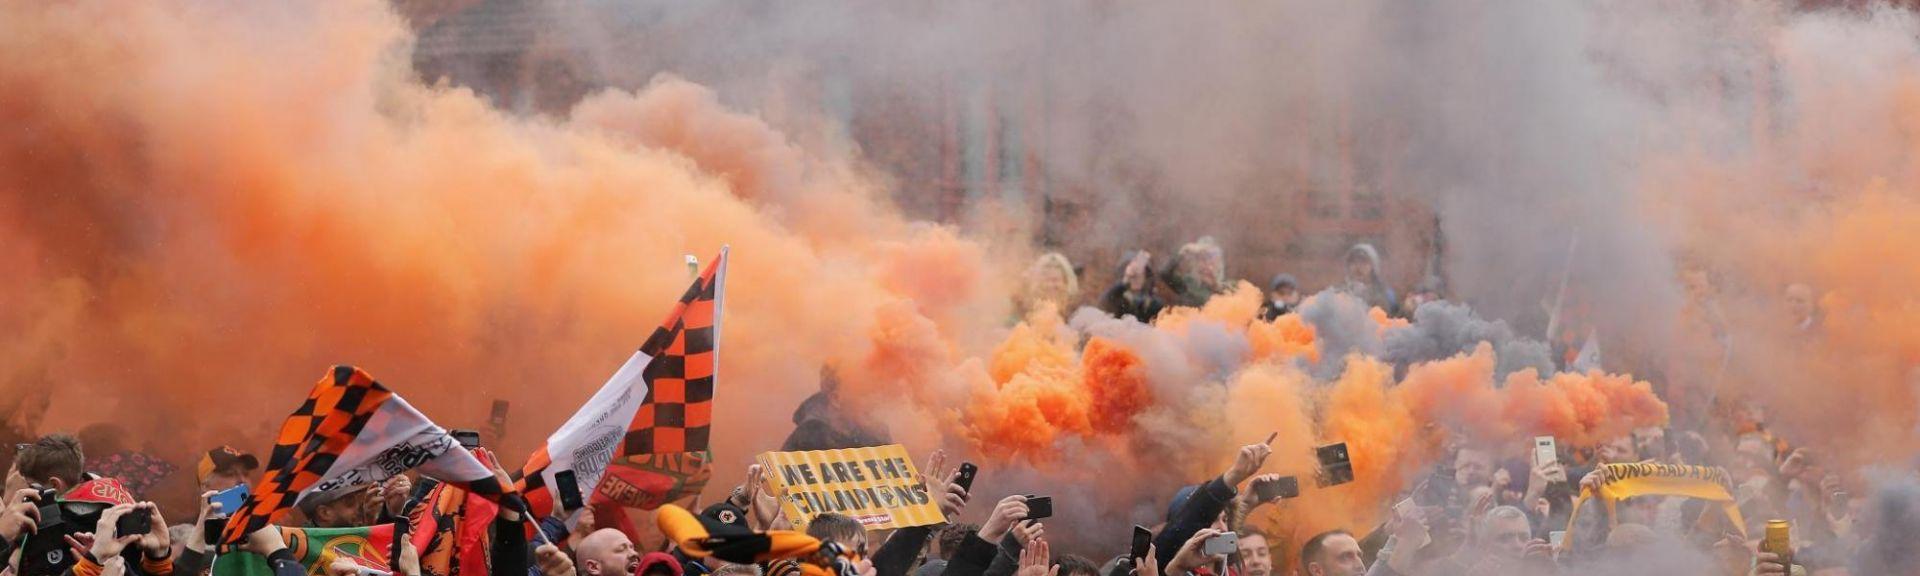 Wolverhampton Wanderers fans